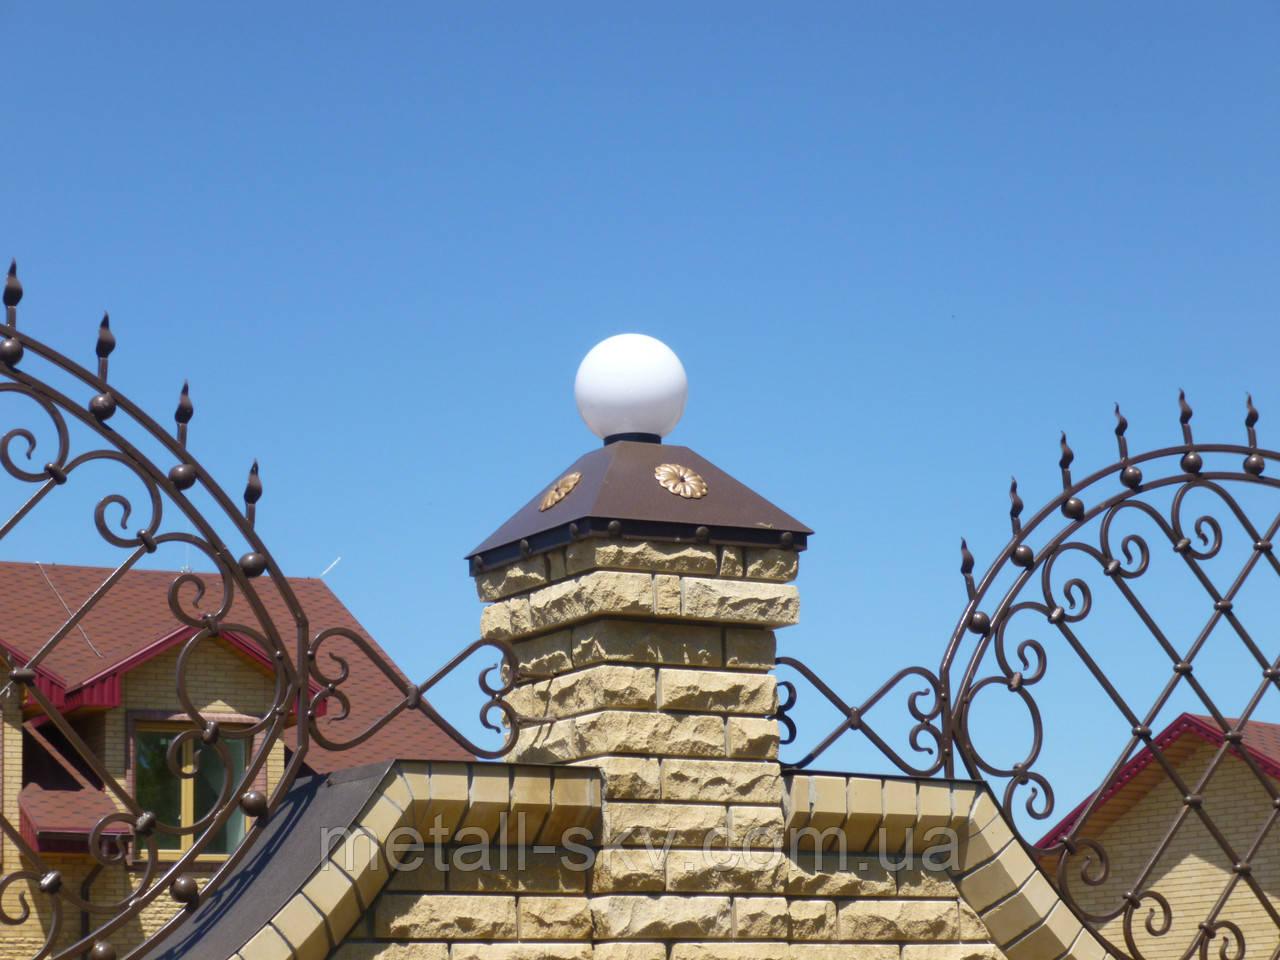 Металлические колпаки на колонны и забор с фонариками из металла 1.5 мм.